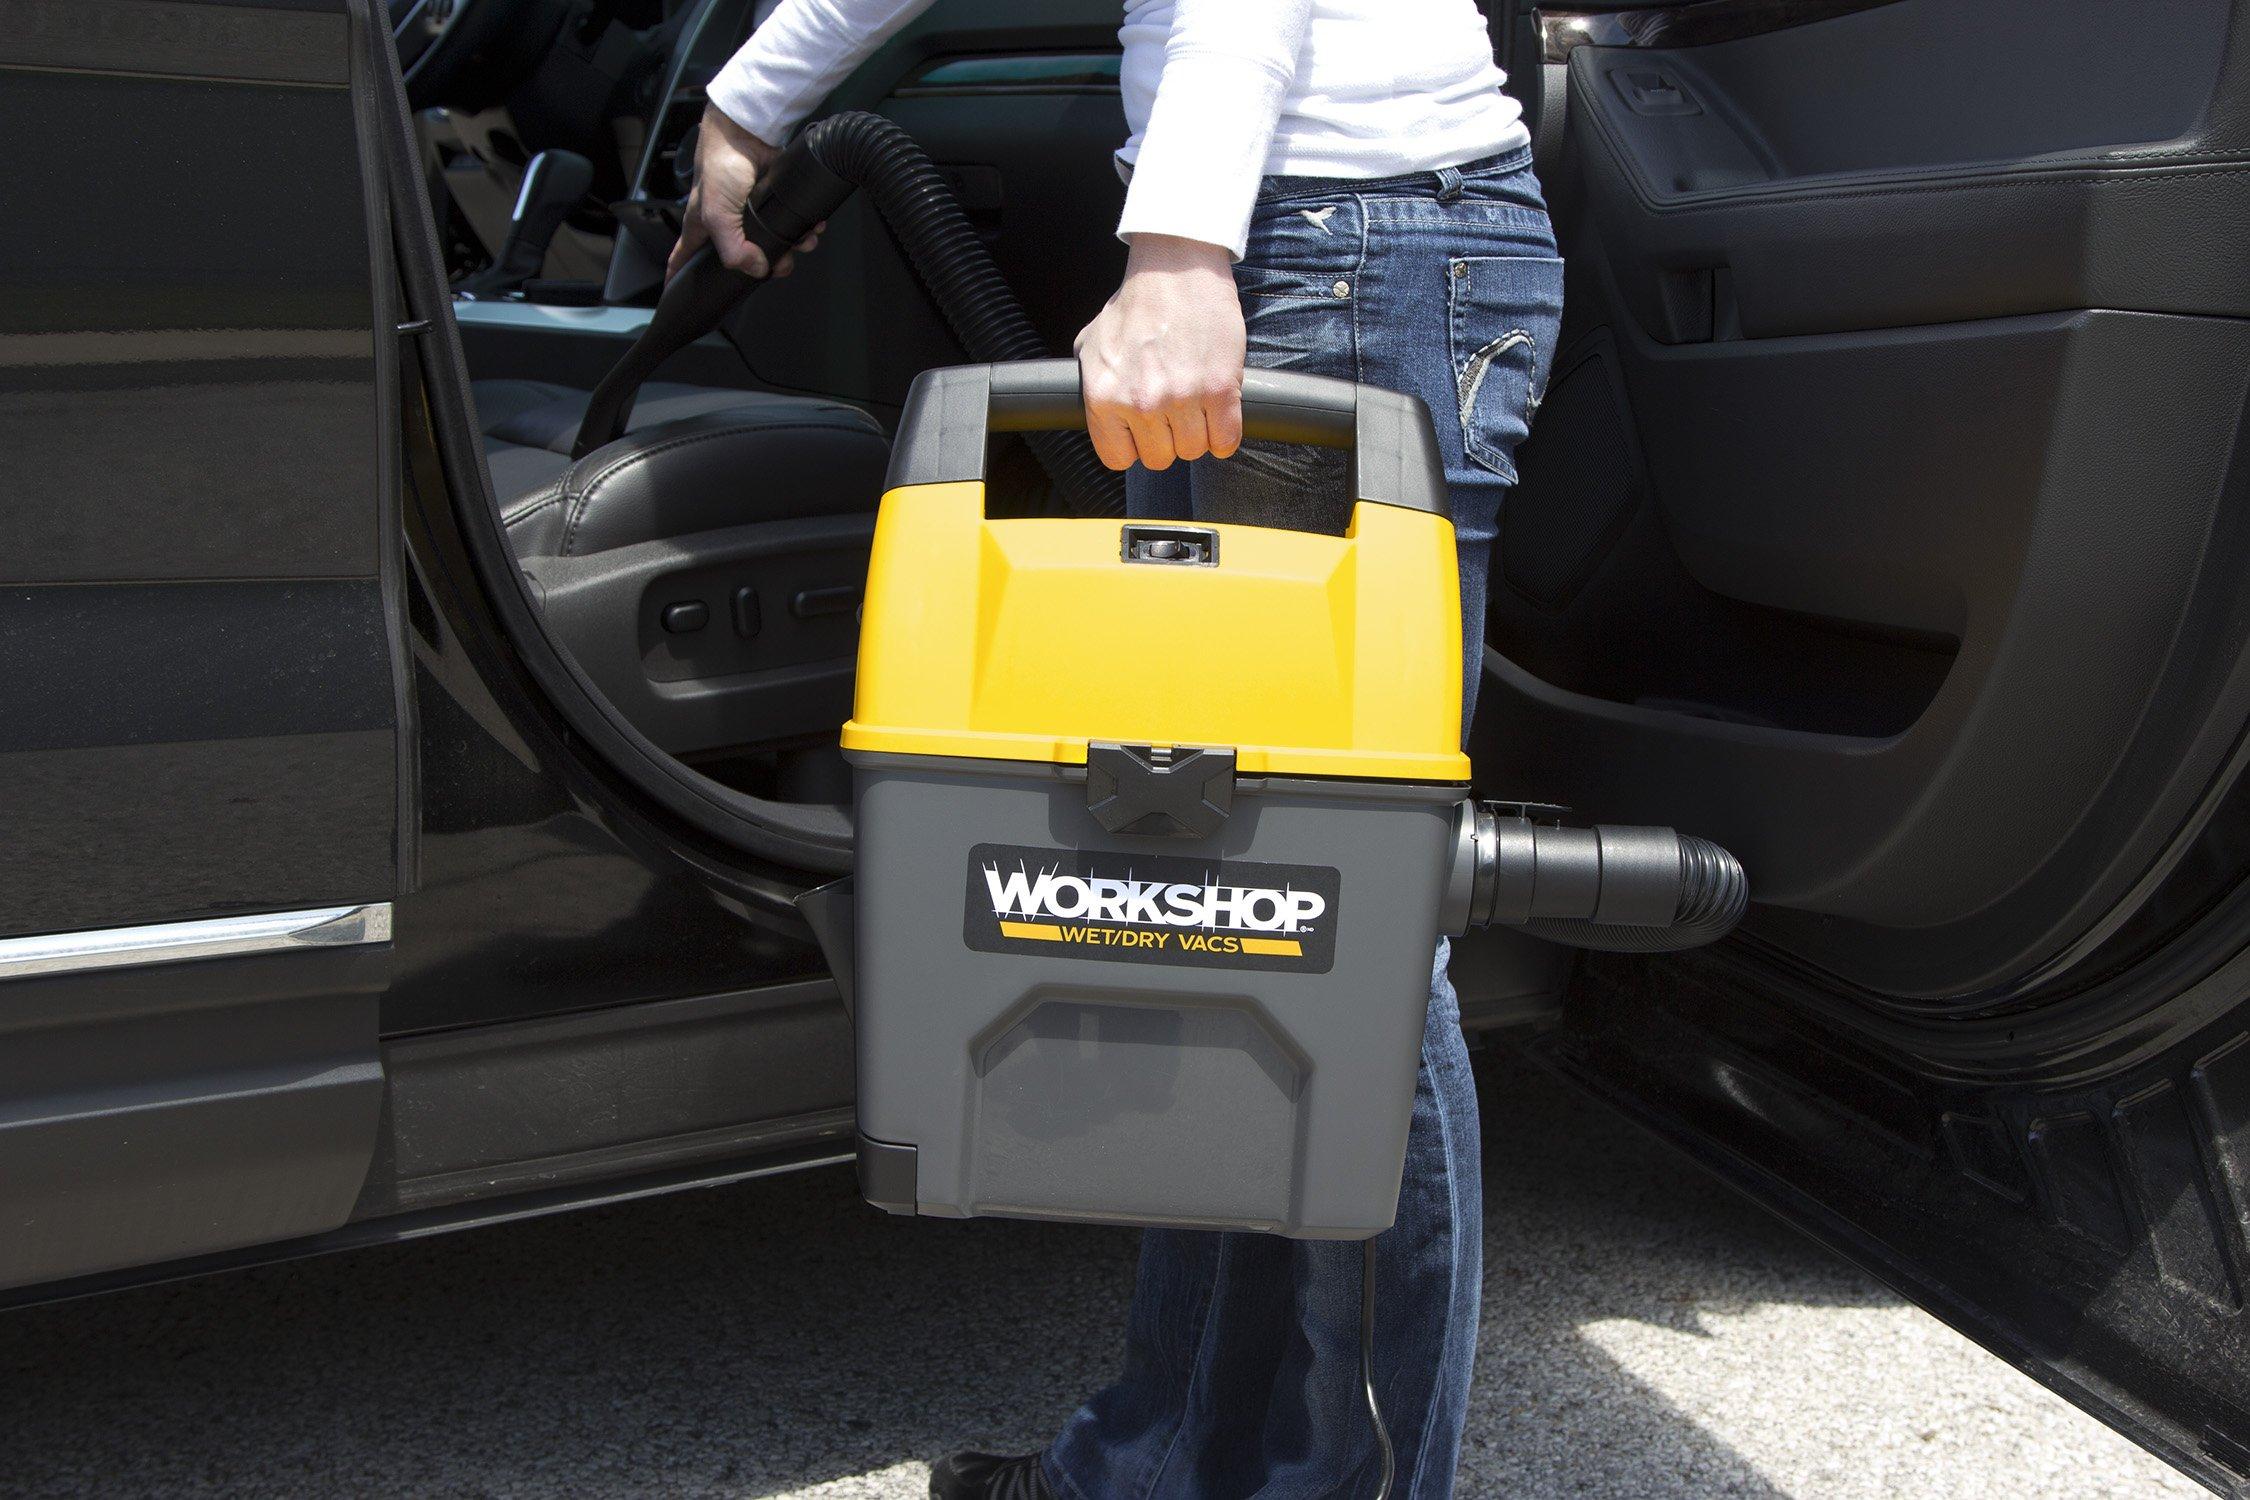 WORKSHOP Wet Dry Vac WS0301VA Portable Wet Dry Vacuum Cleaner For Car, 3-Gallon Wet Dry Auto Vacuum Cleaner, 3.5 Peak HP Portable Auto Vacuum With Accessories For Car Cleaning by WORKSHOP Wet/Dry Vacs (Image #4)